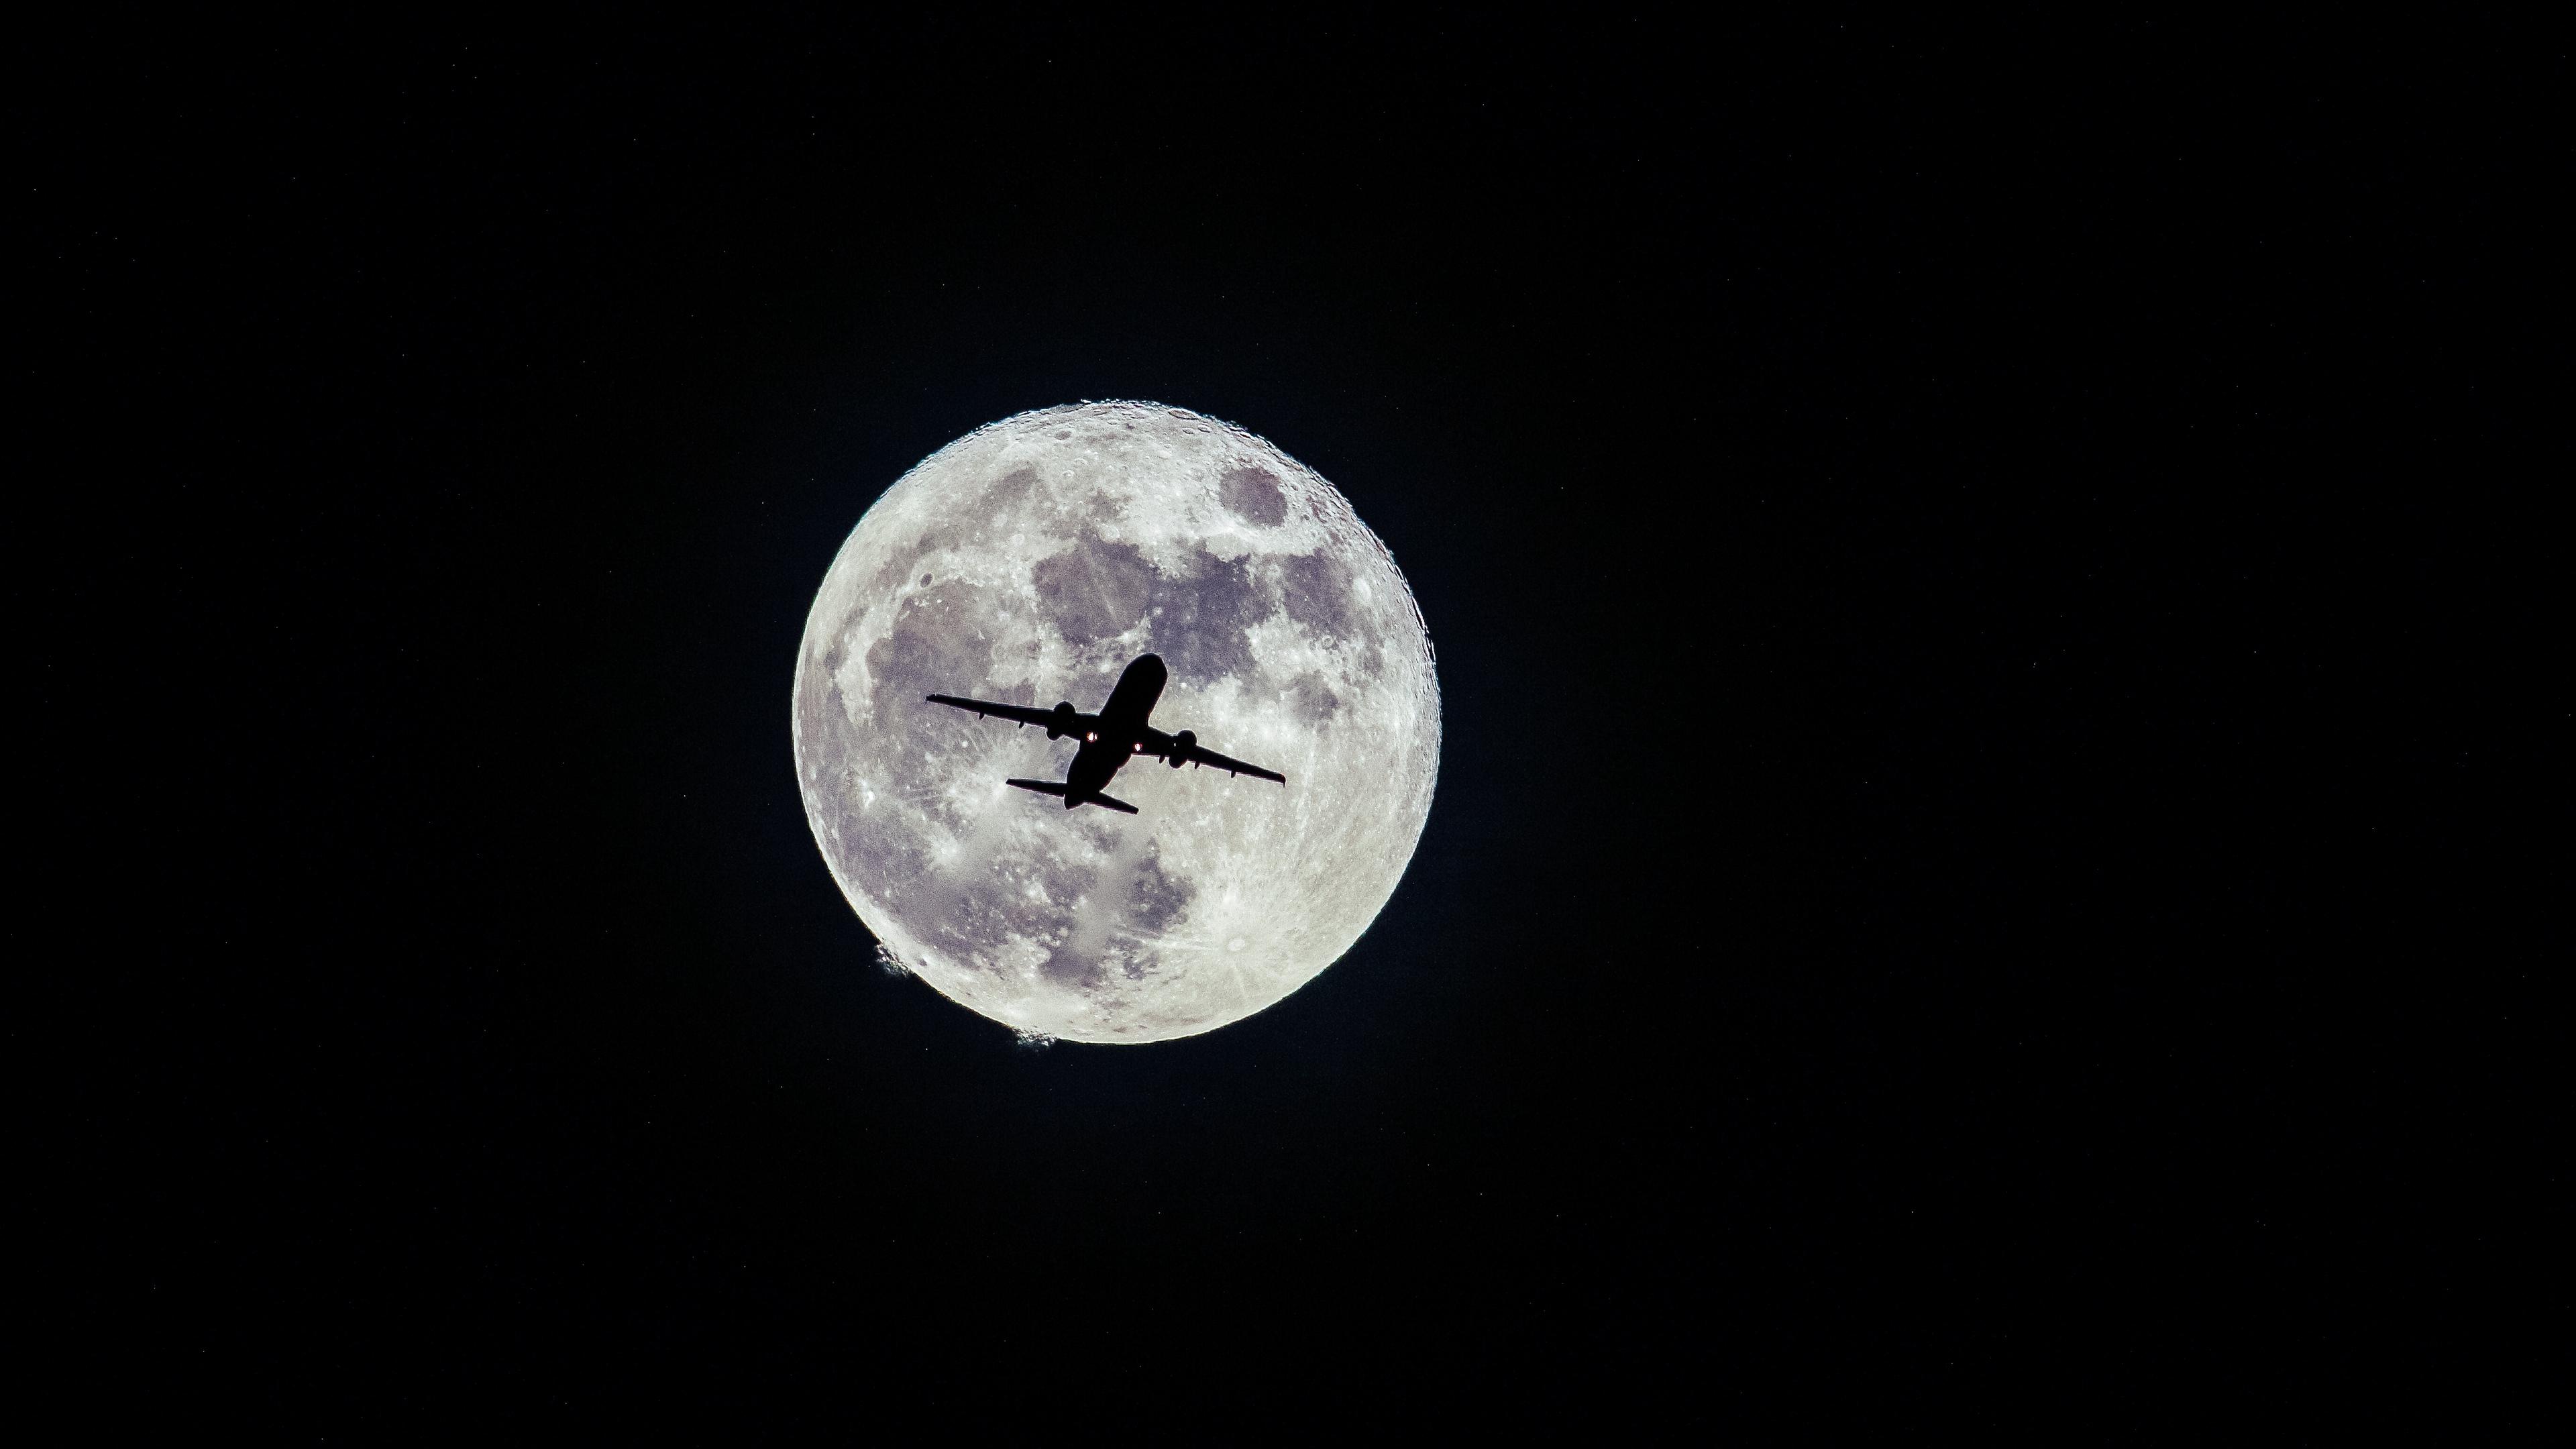 airplane moon flight bw 4k 1536016621 - airplane, moon, flight, bw 4k - Moon, Flight, Airplane